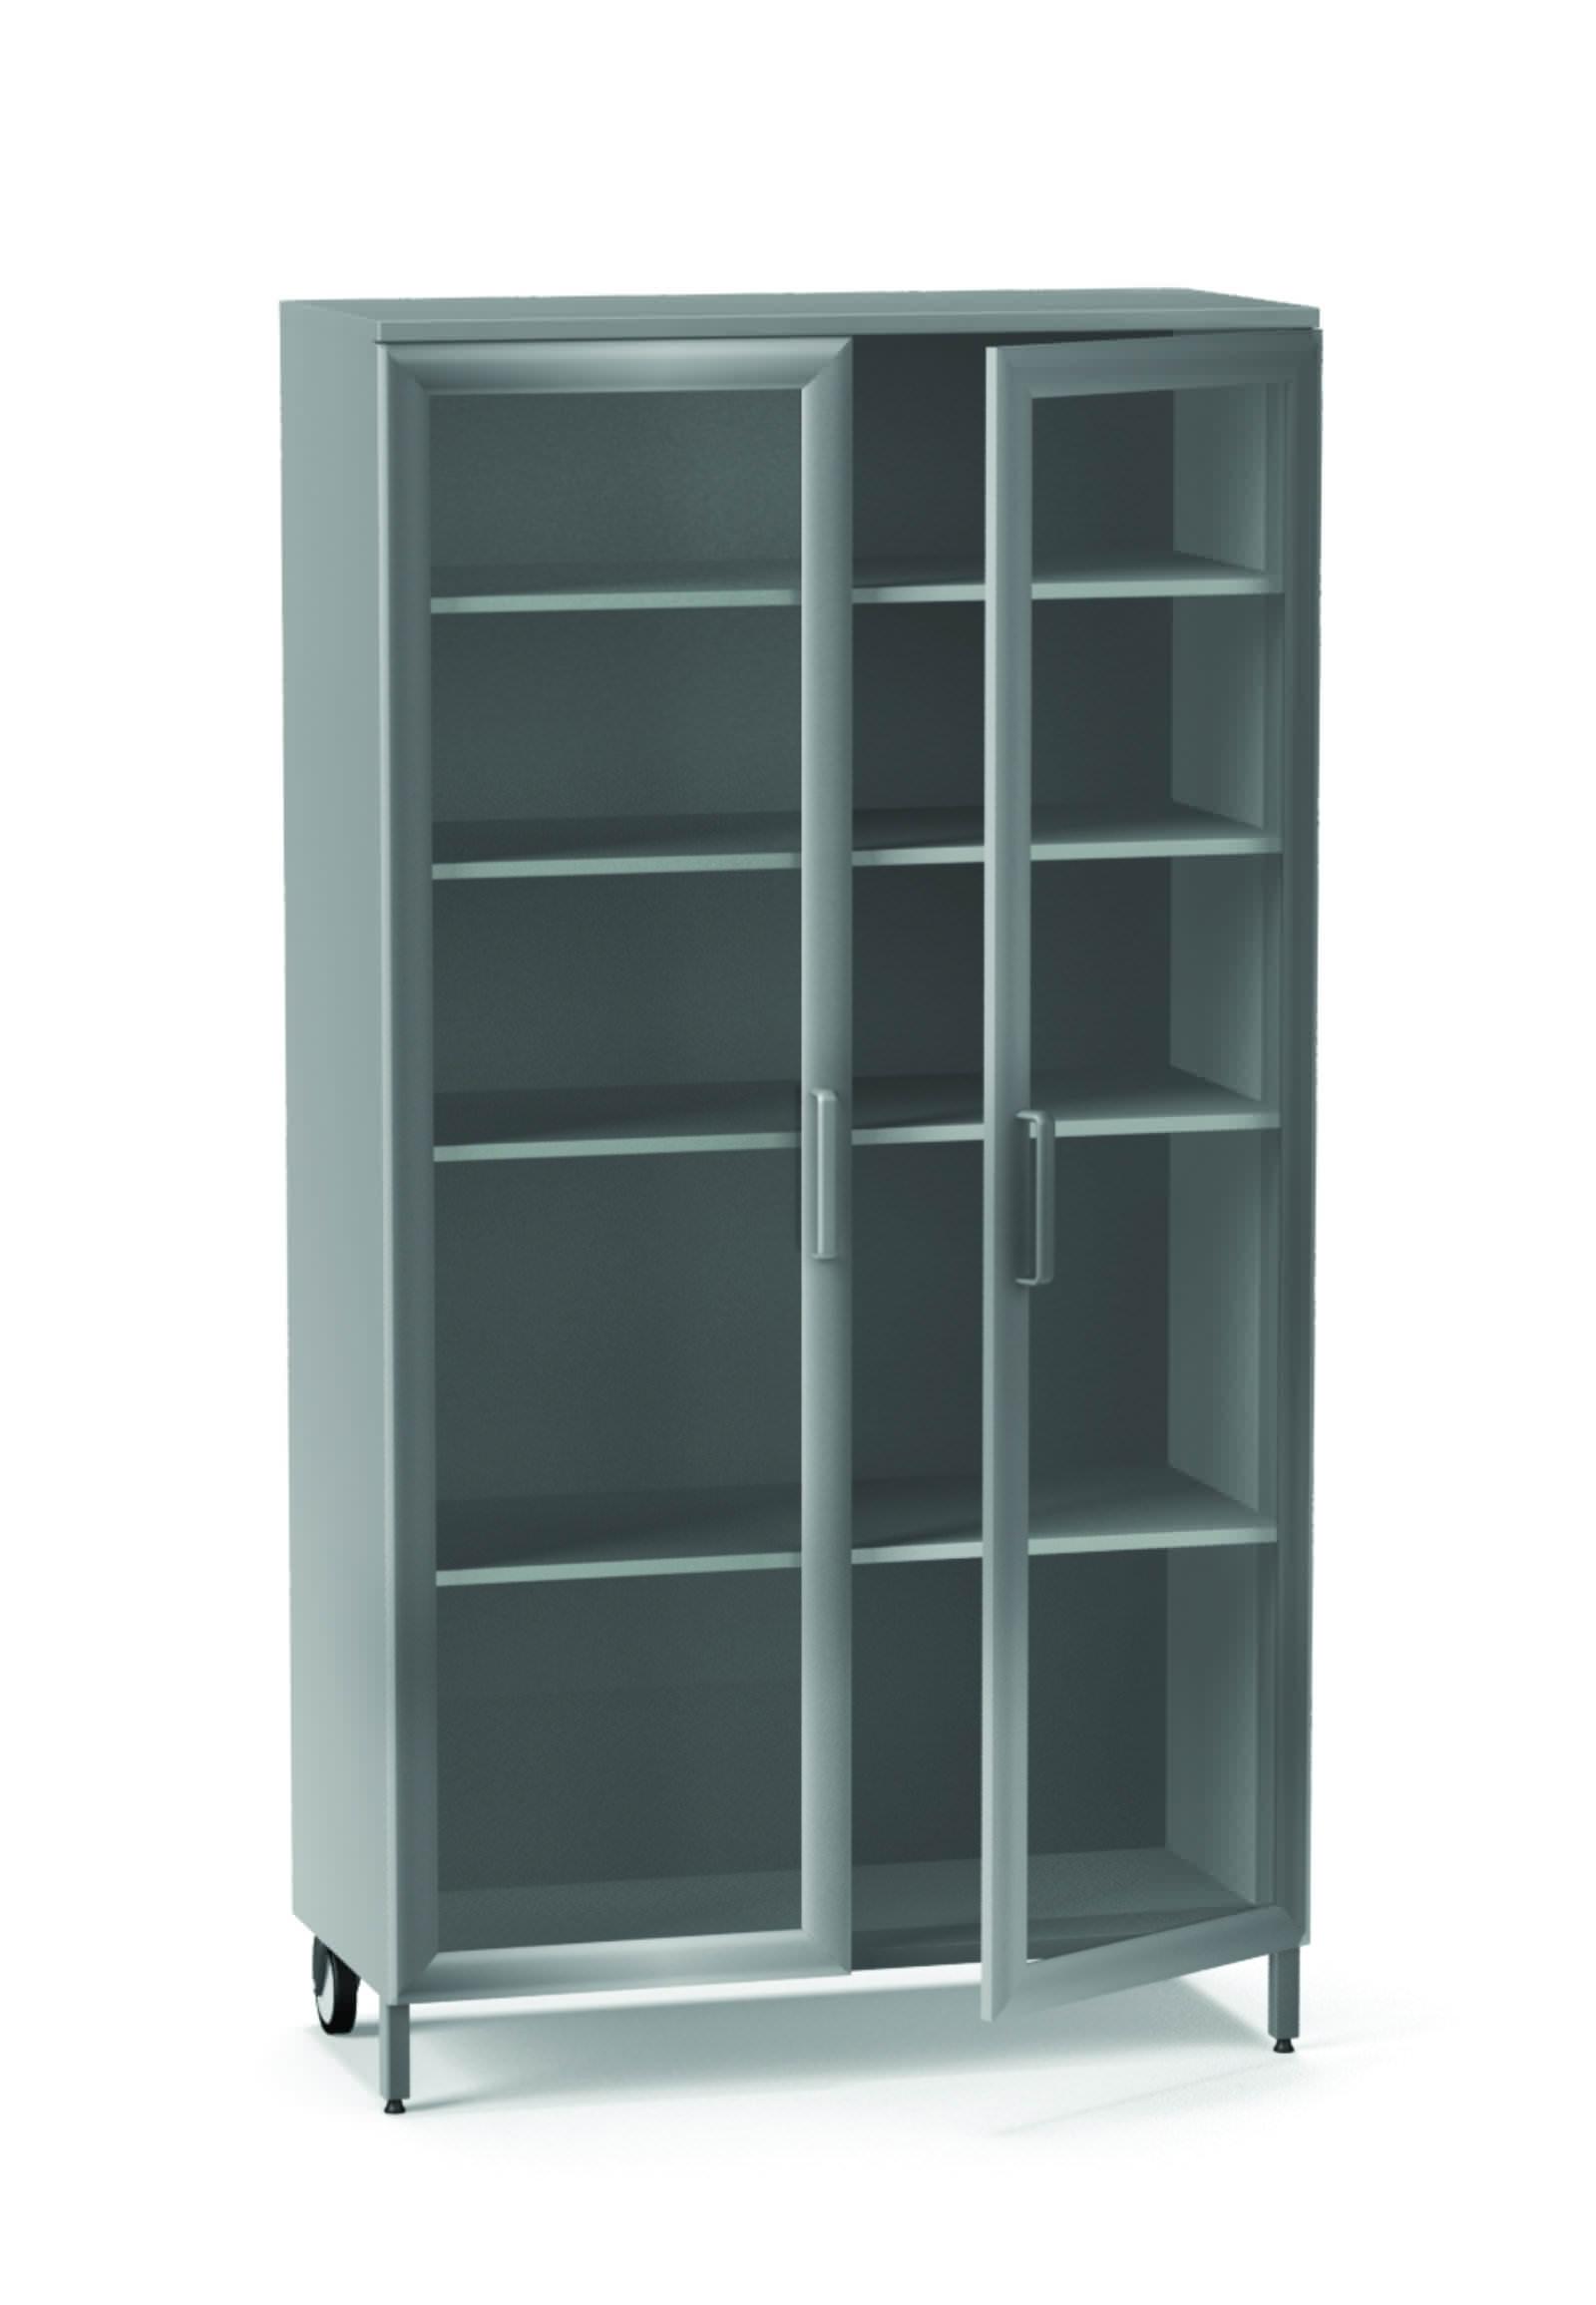 Шкаф медицинский ДМ-6-001-15